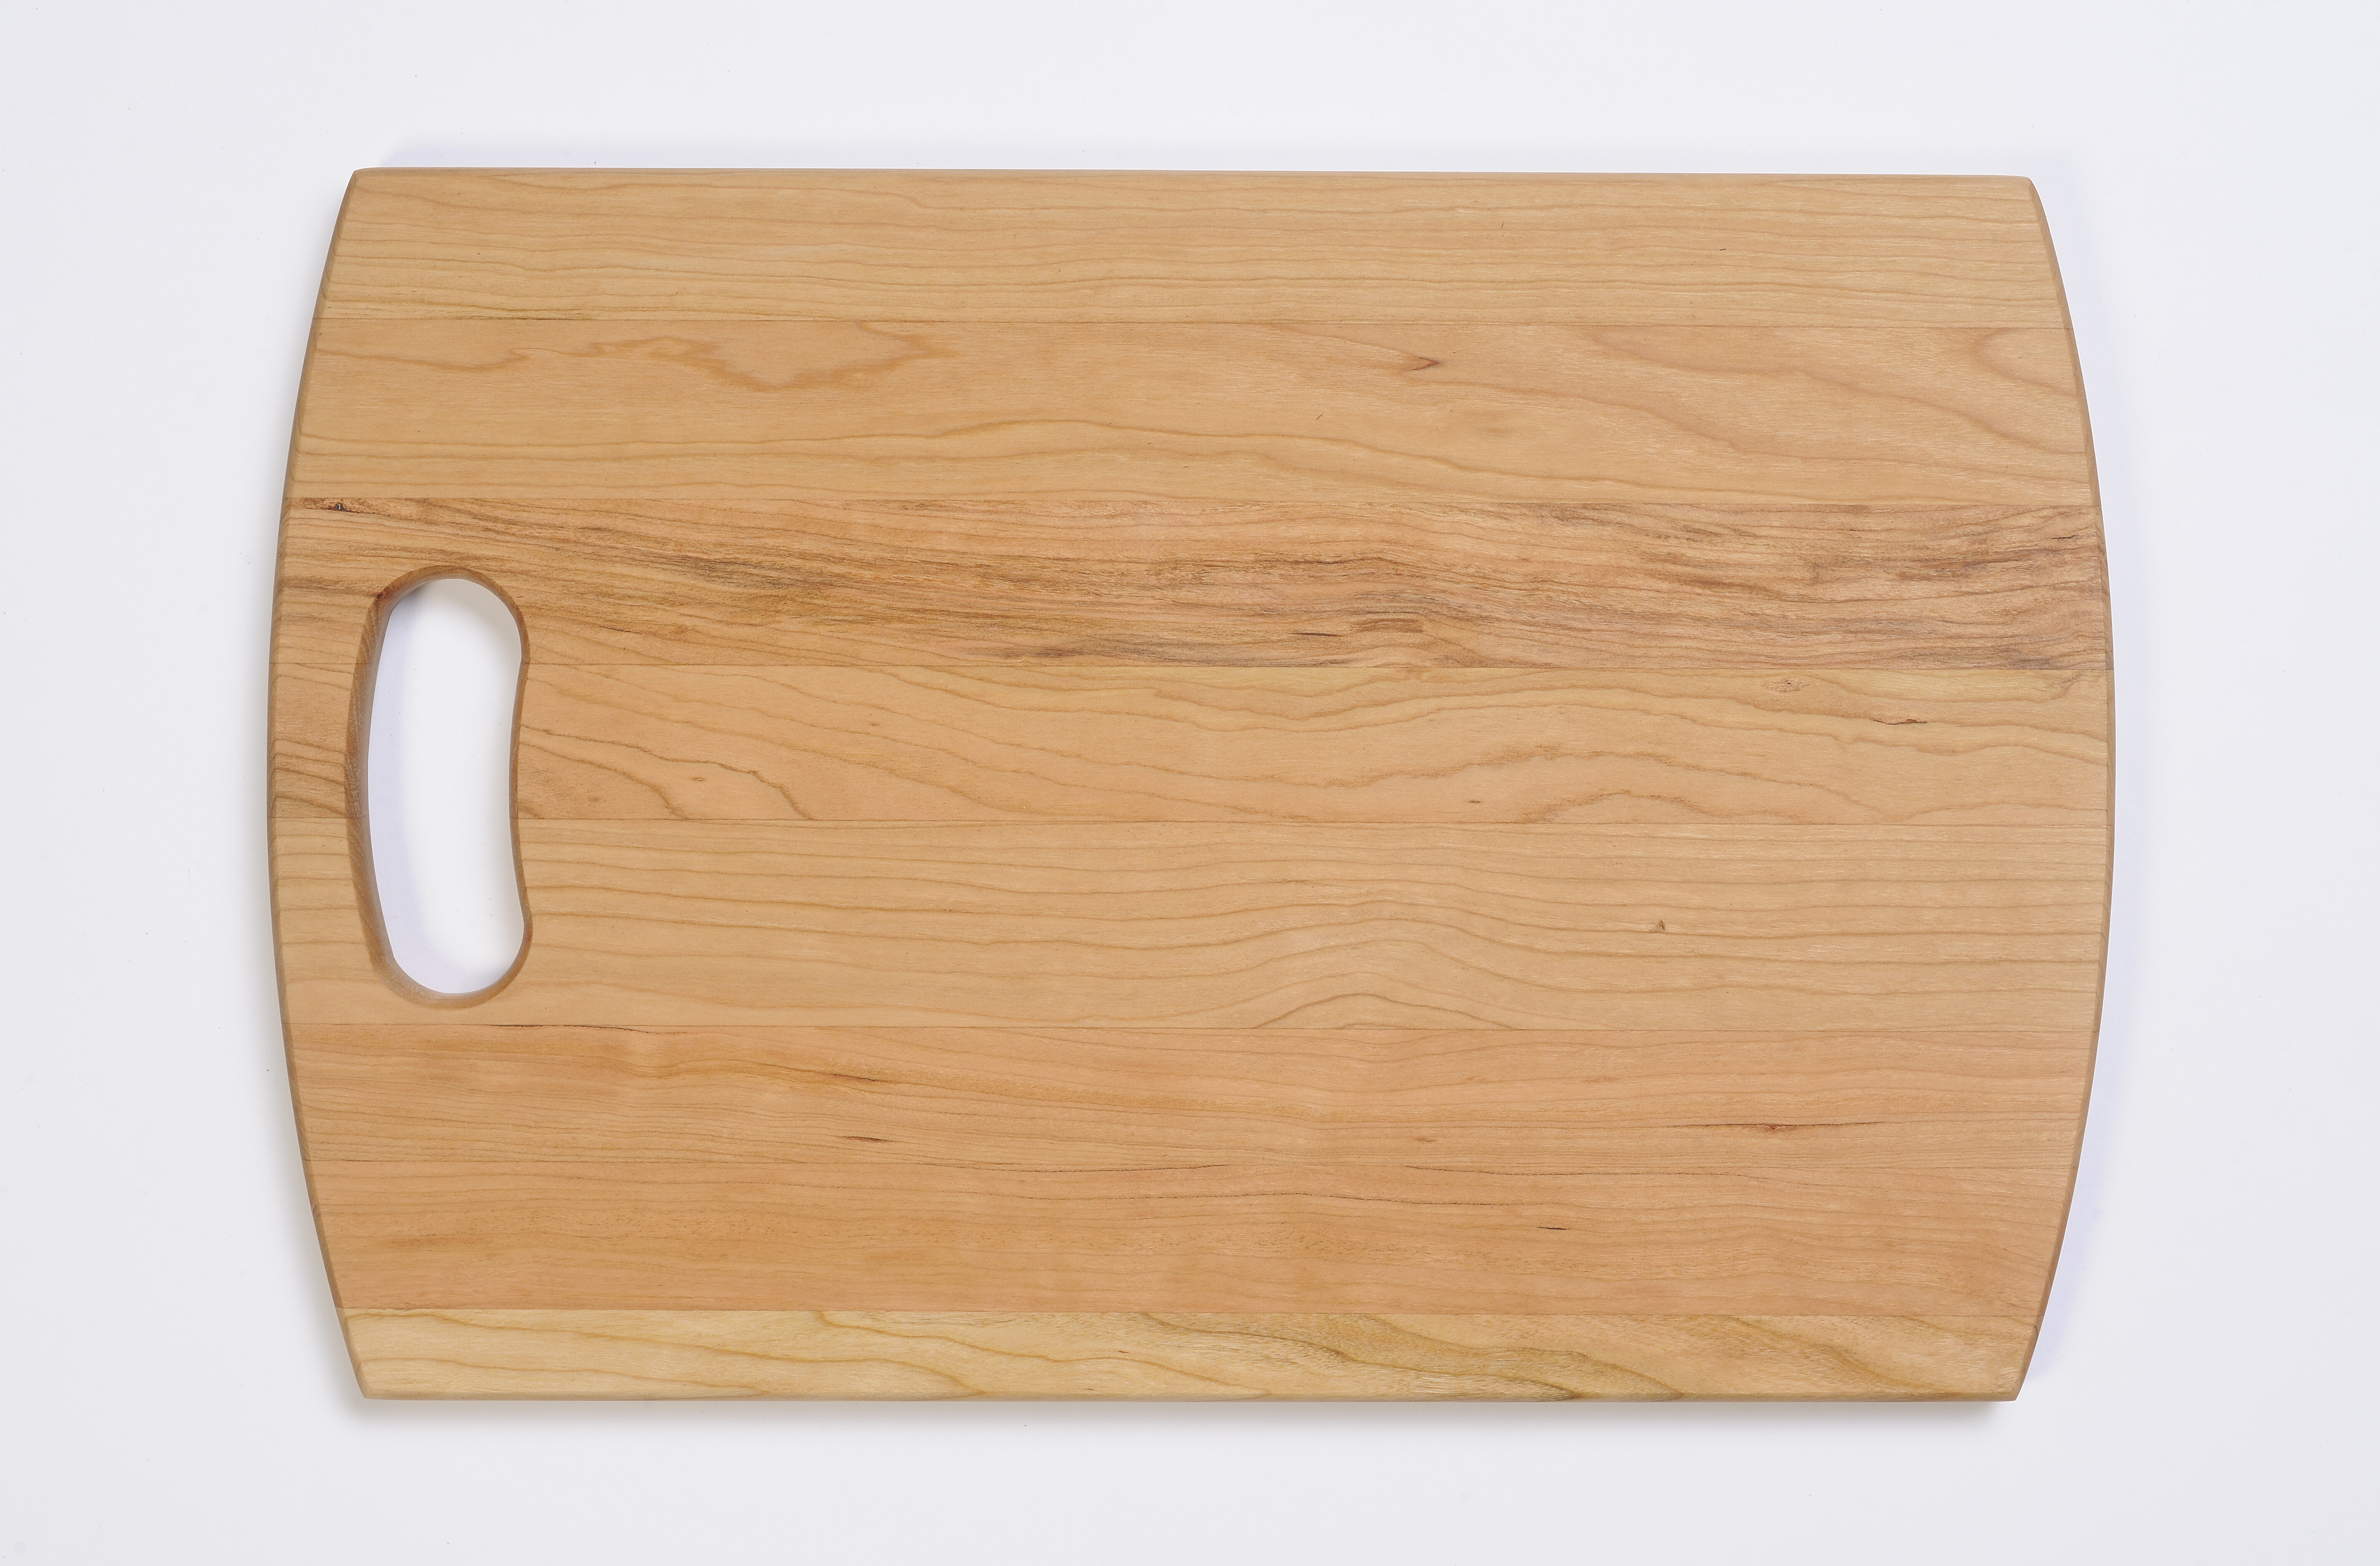 Warther Boards Cherry Wood Cutting Board Wayfair